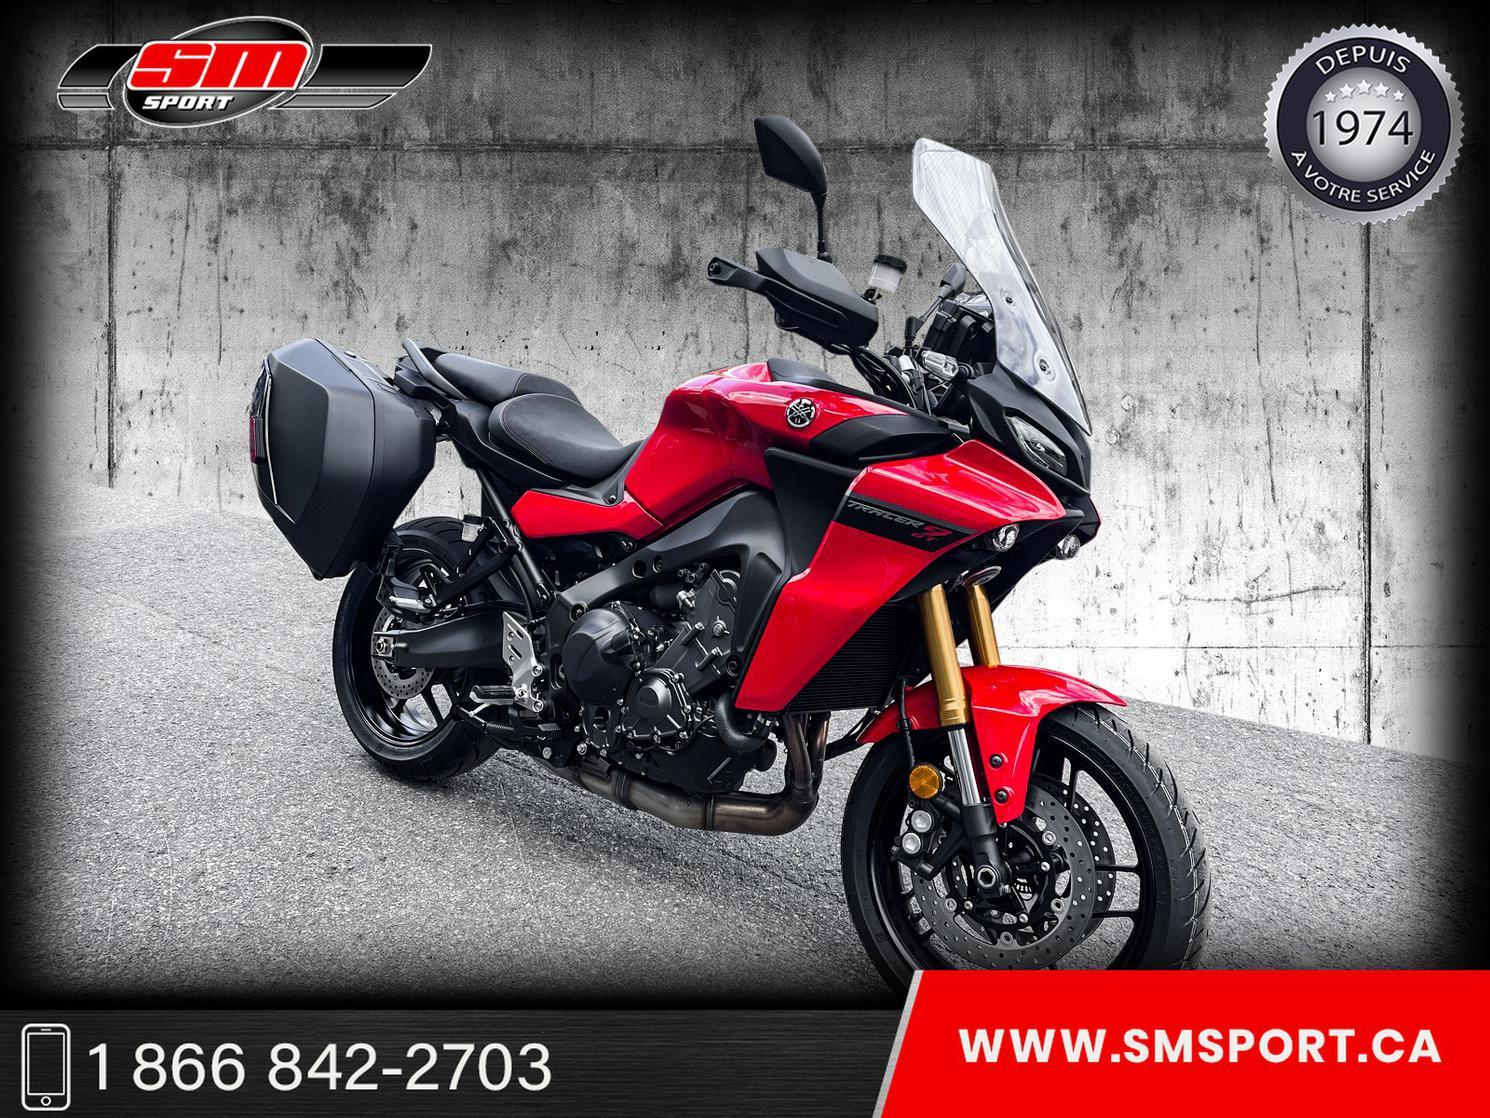 2021 Yamaha TRACER 900 GT - NOUVEAU MODELE 2021 - DEMO